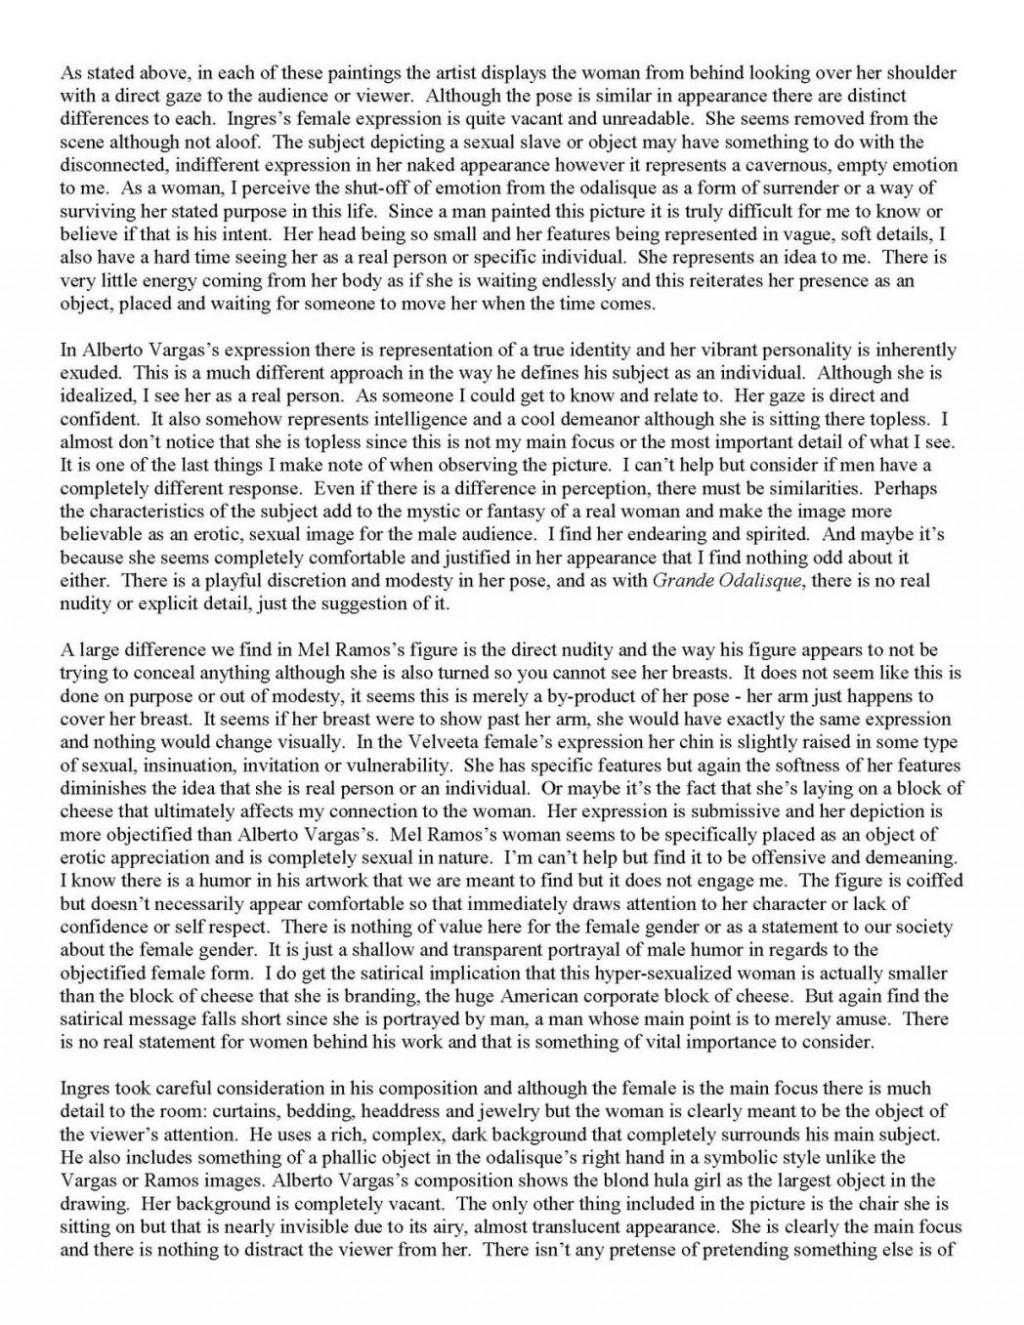 007 Essay Example Visual Examples Of Analysis Essays Outline Movie Visualanalysisfinaldraft P Image Sample Rhetorical Text Advertisement Argument Shocking Response Literacy Arts Large